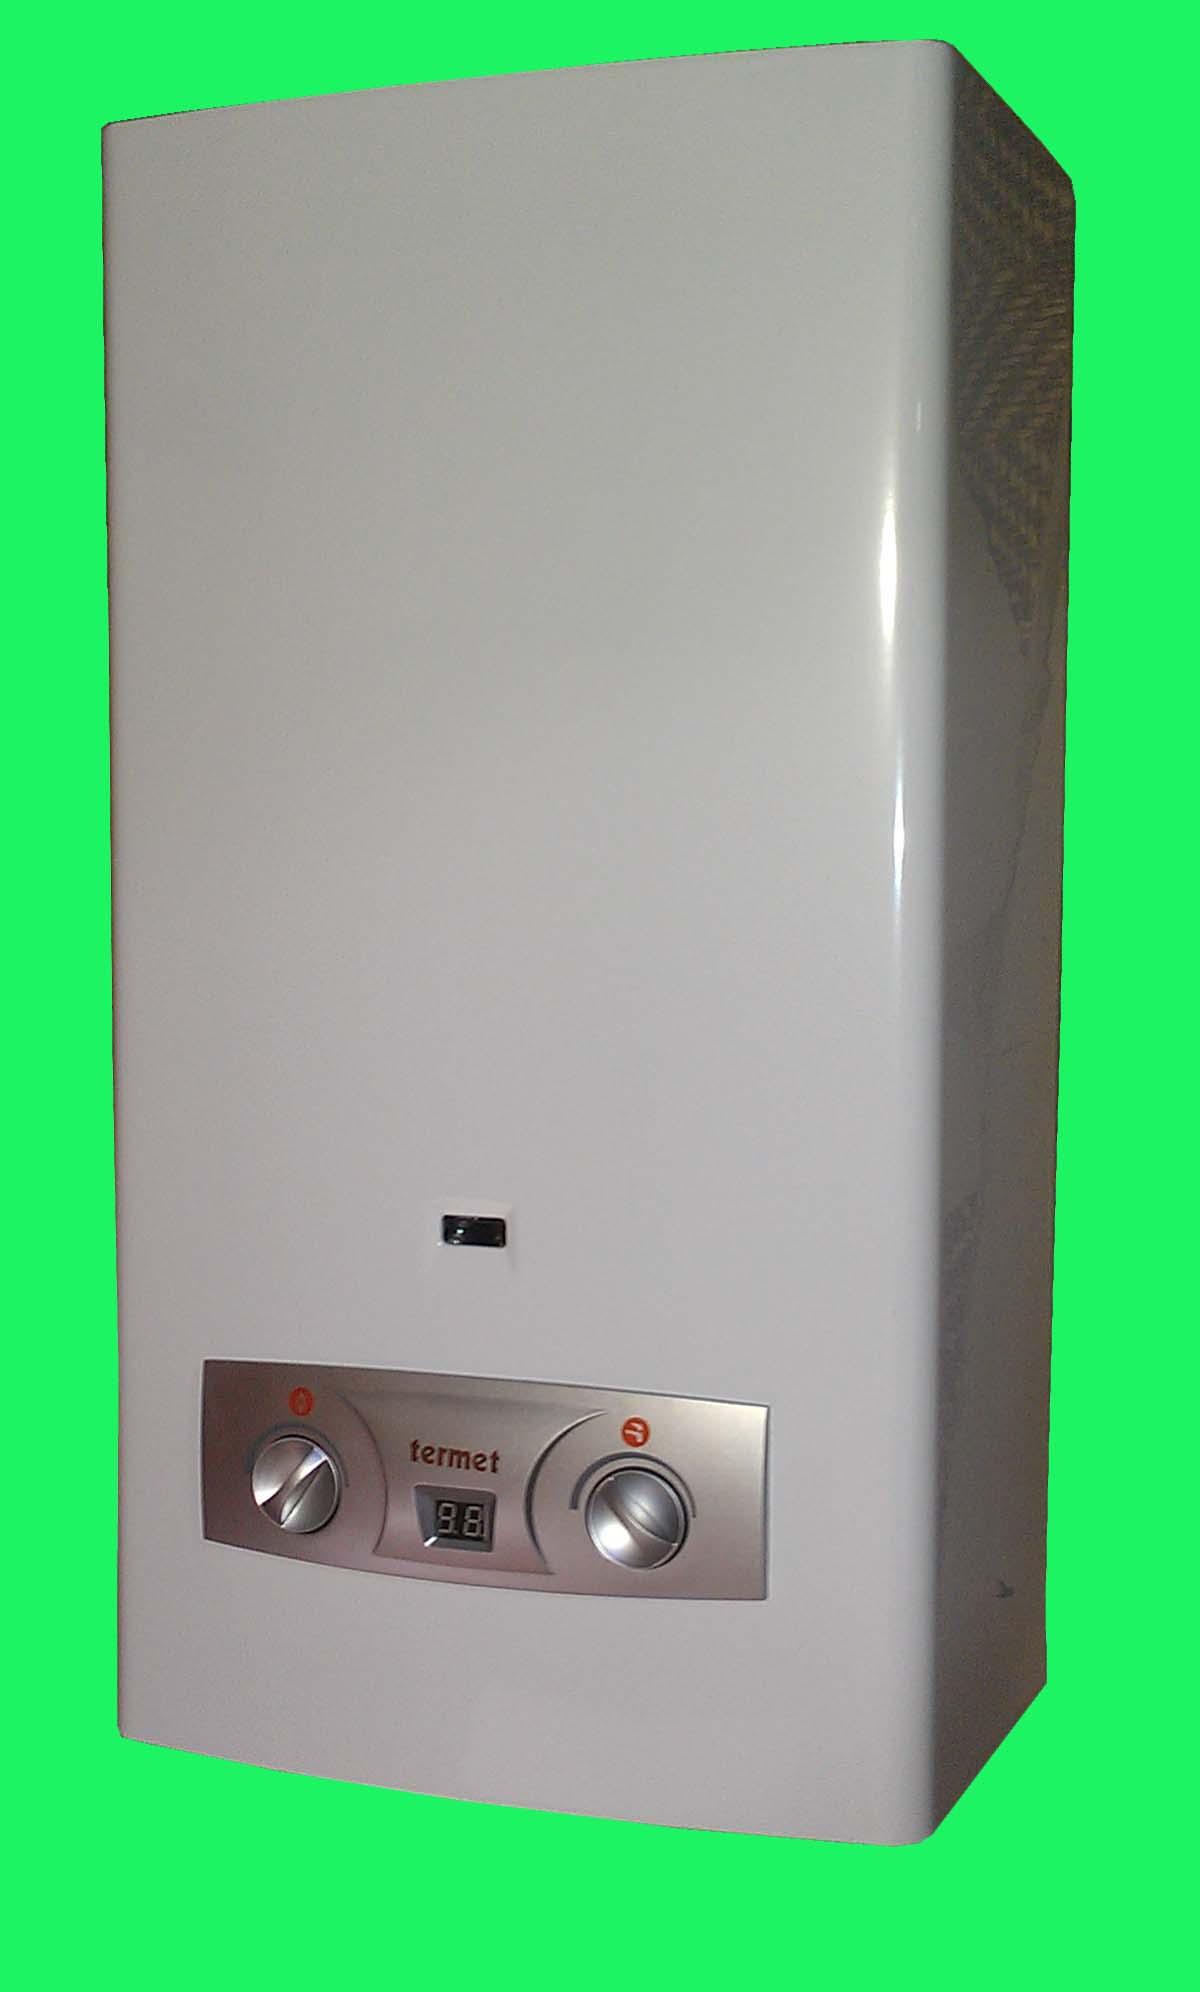 Колонка газовая Termet Aqua Heat electronic G-19-00 LCD